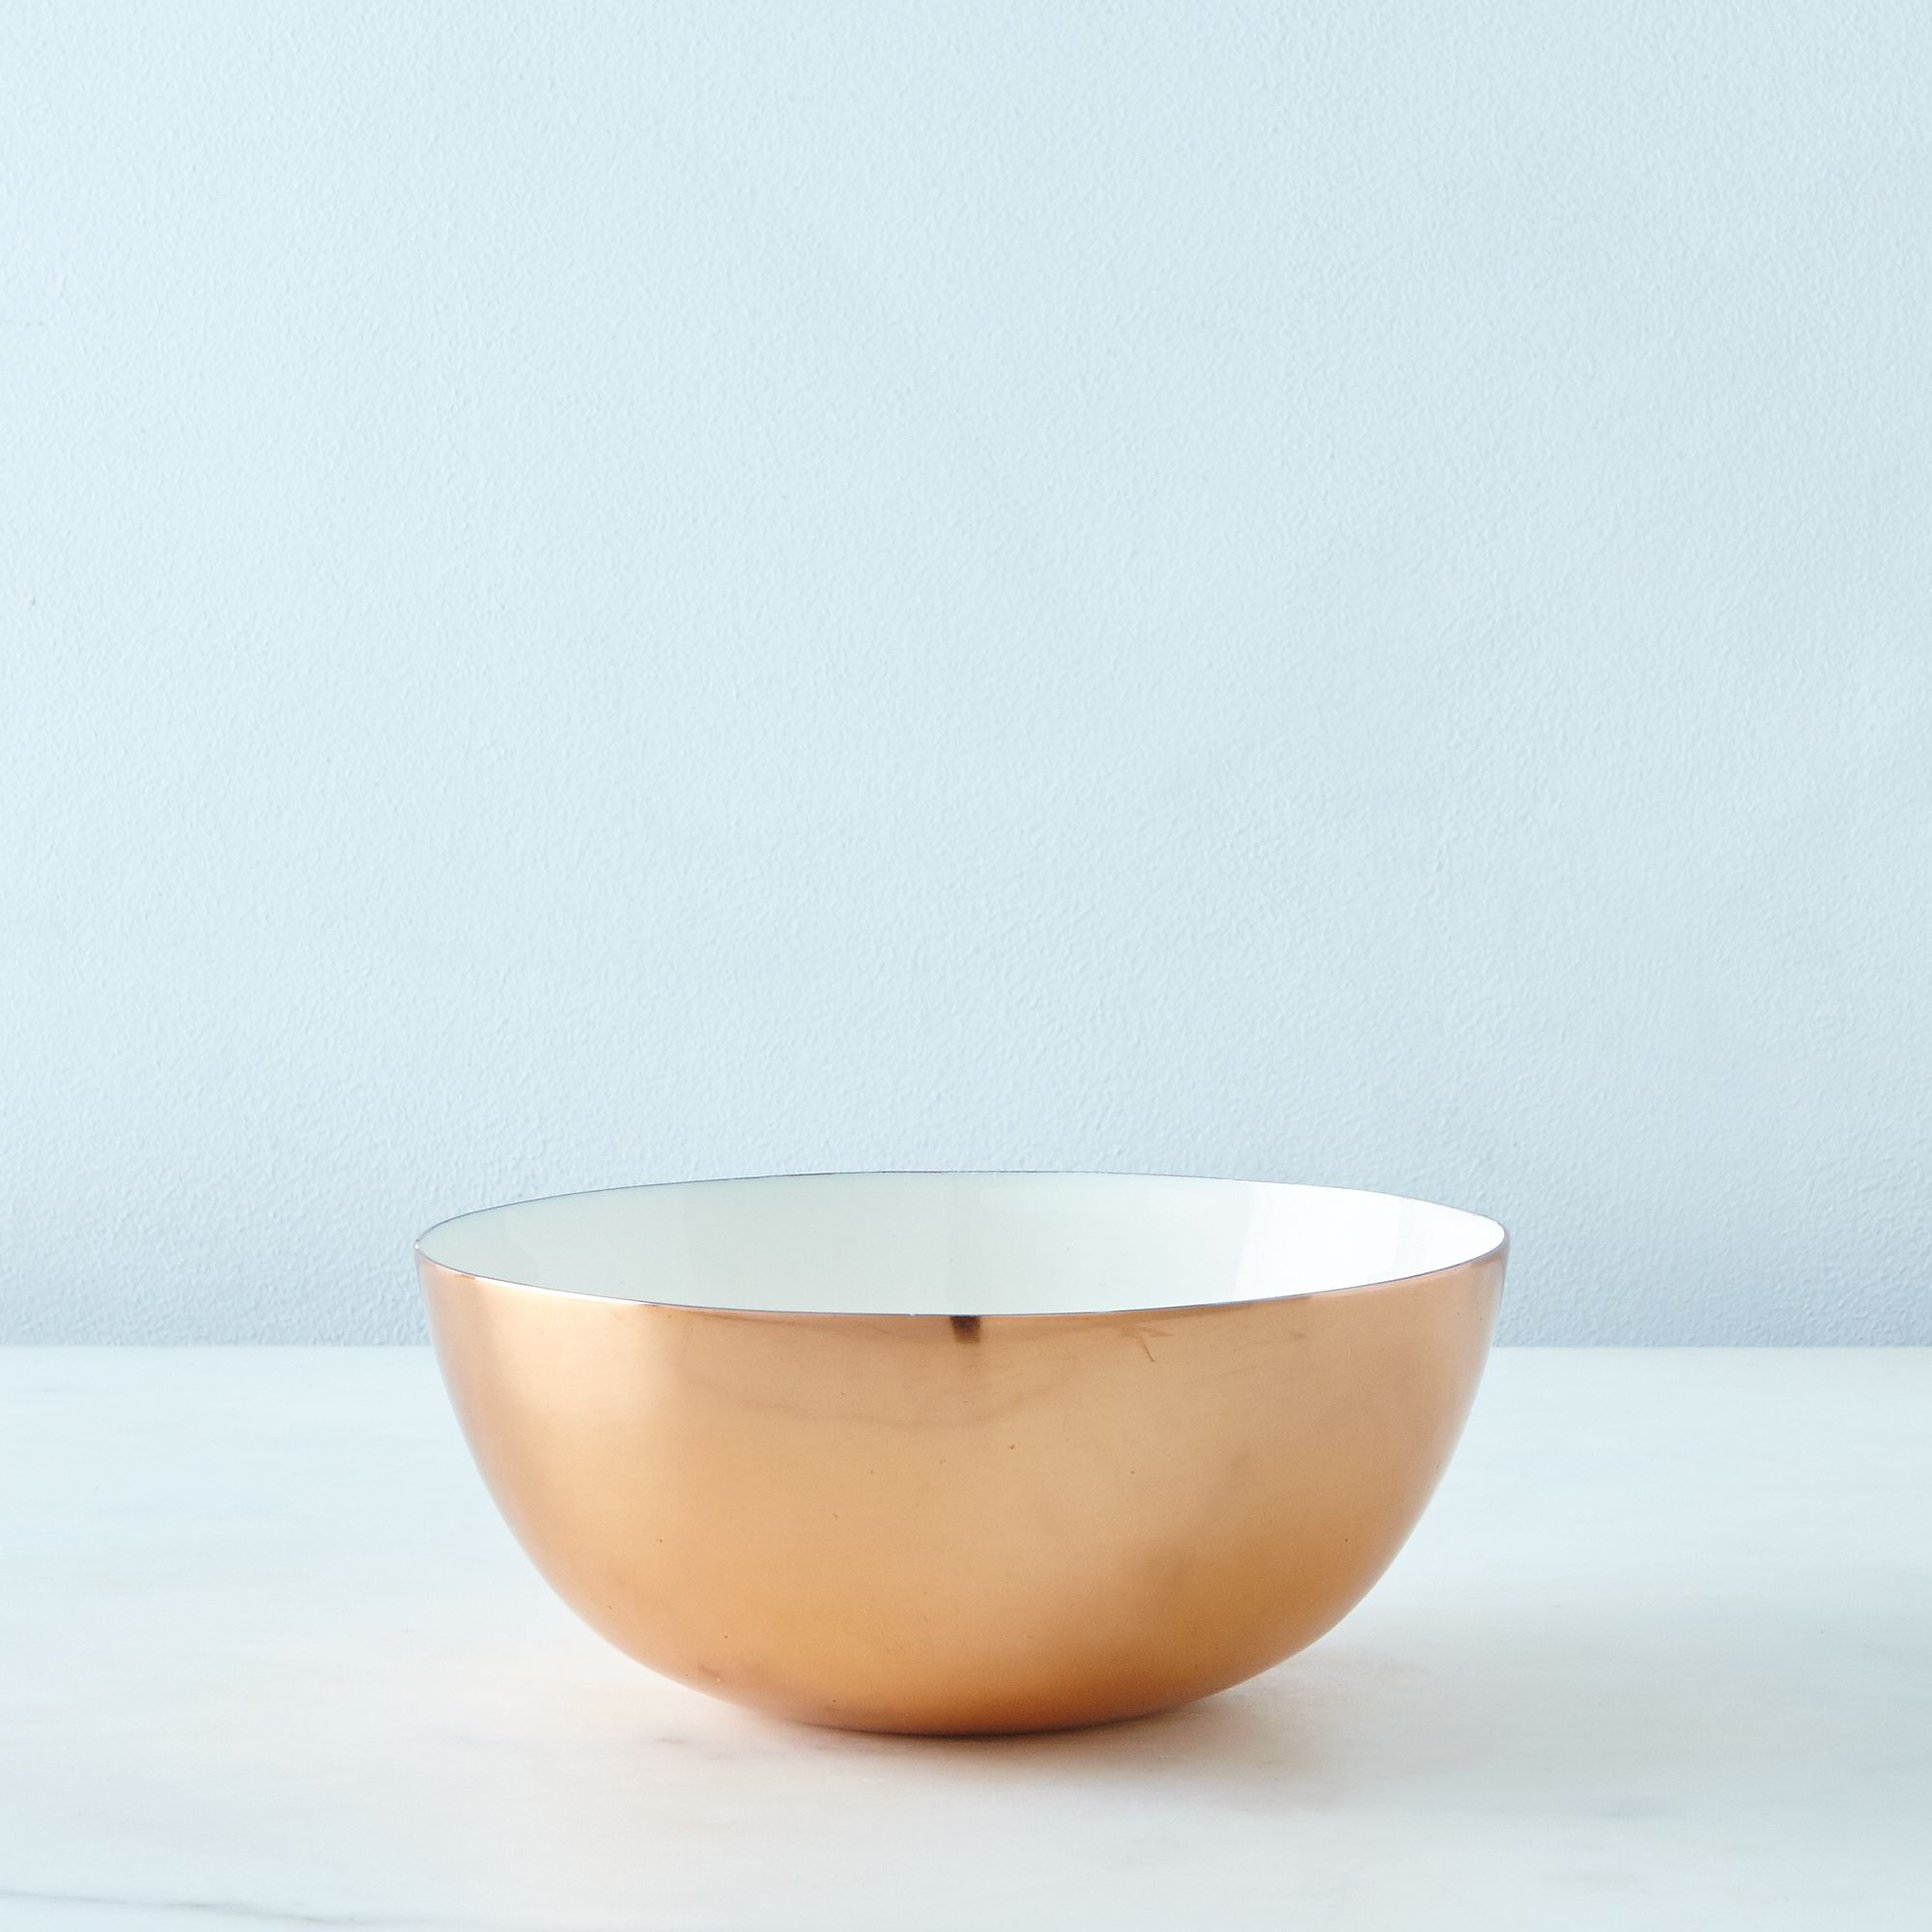 99dd86a8 c8d6 11e5 9cb7 0ec3b80ccb89  2015 1104 hawkins ny louise copper brass enamel bowls copper small silo rocky luten 002 copy